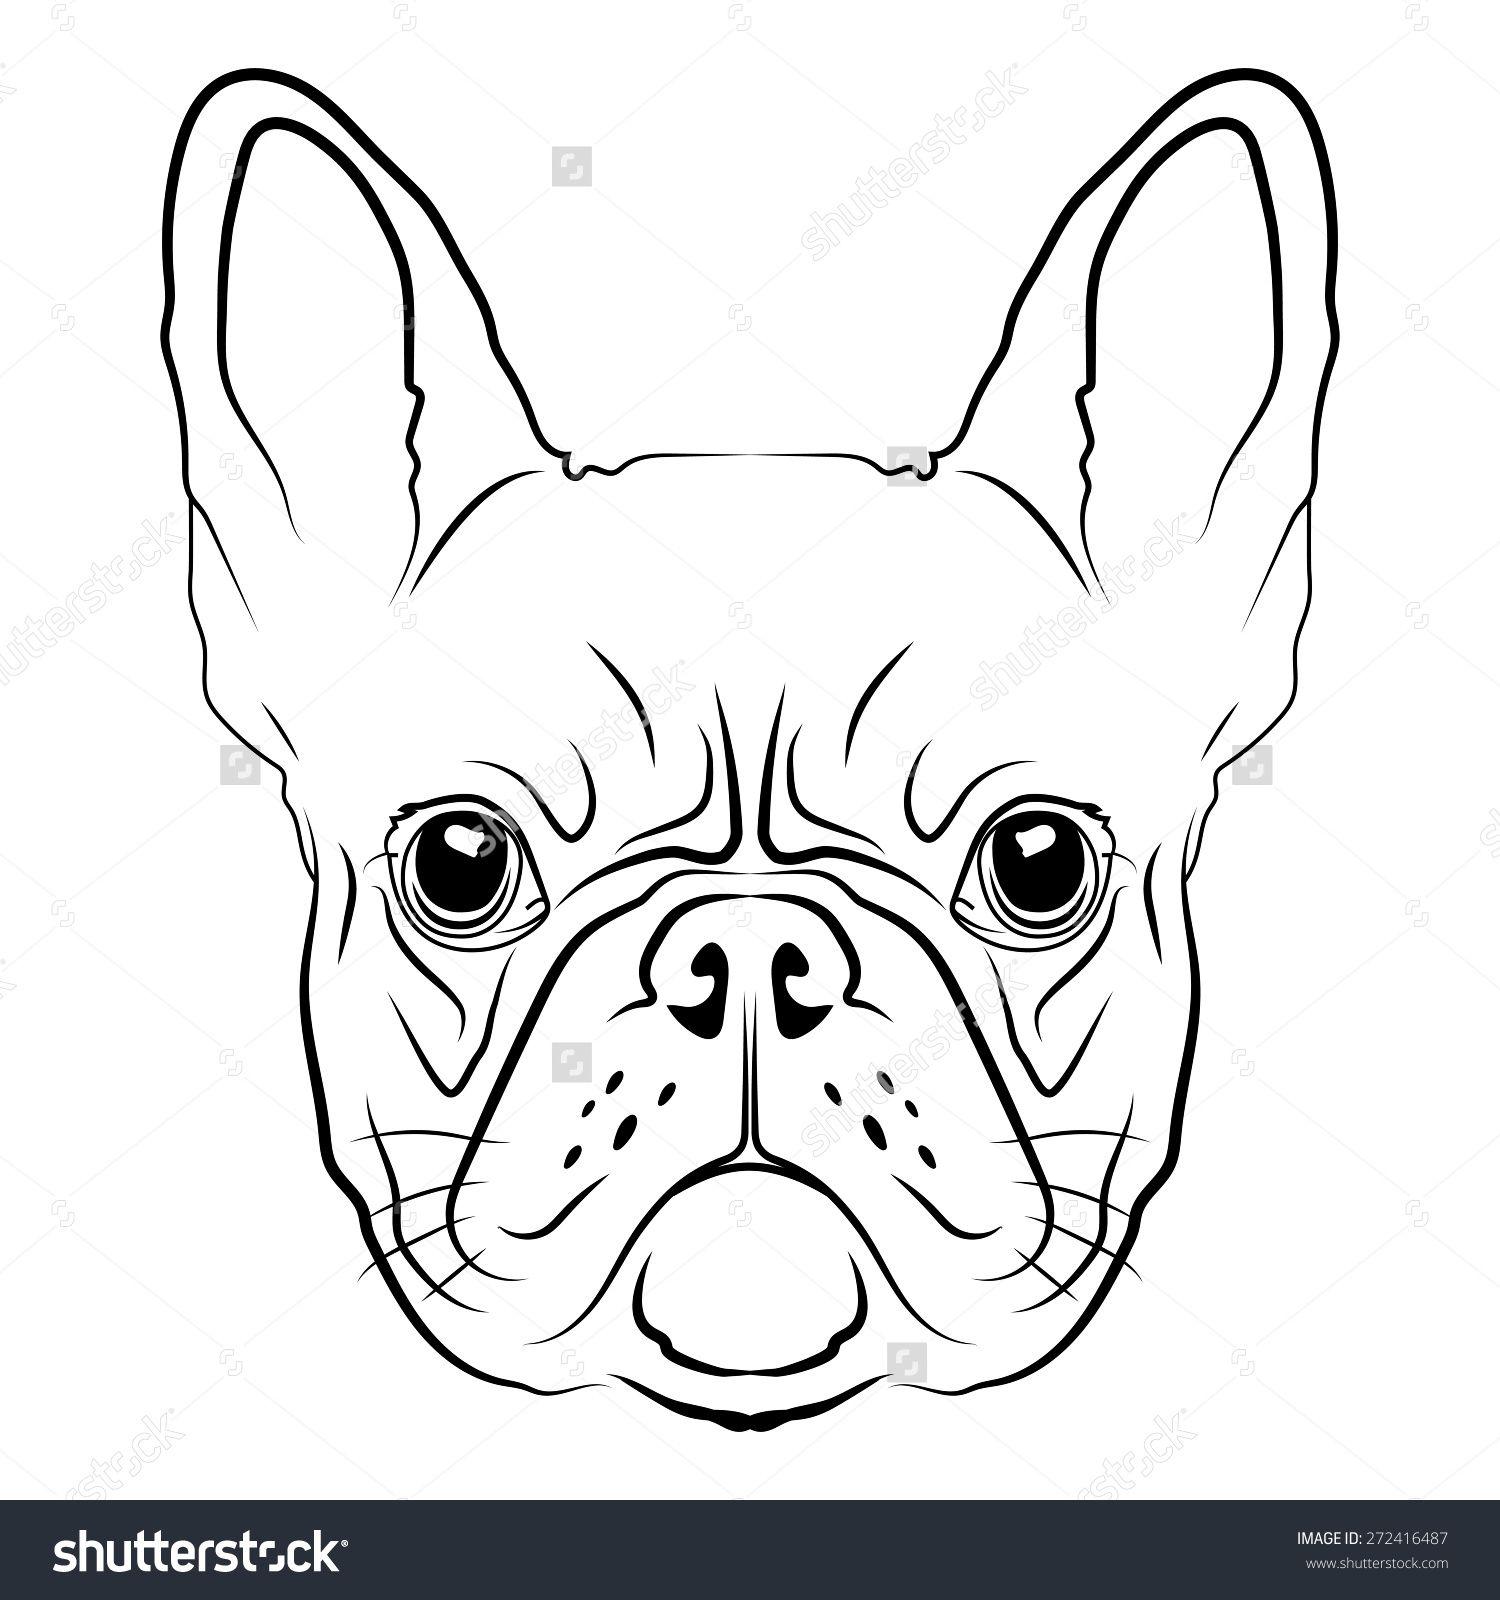 Znalezione Obrazy Dla Zapytania French Bulldog Graphic Bulldogge Tattoo Franzosische Bulldoggen Kunst Tiere Zeichnen